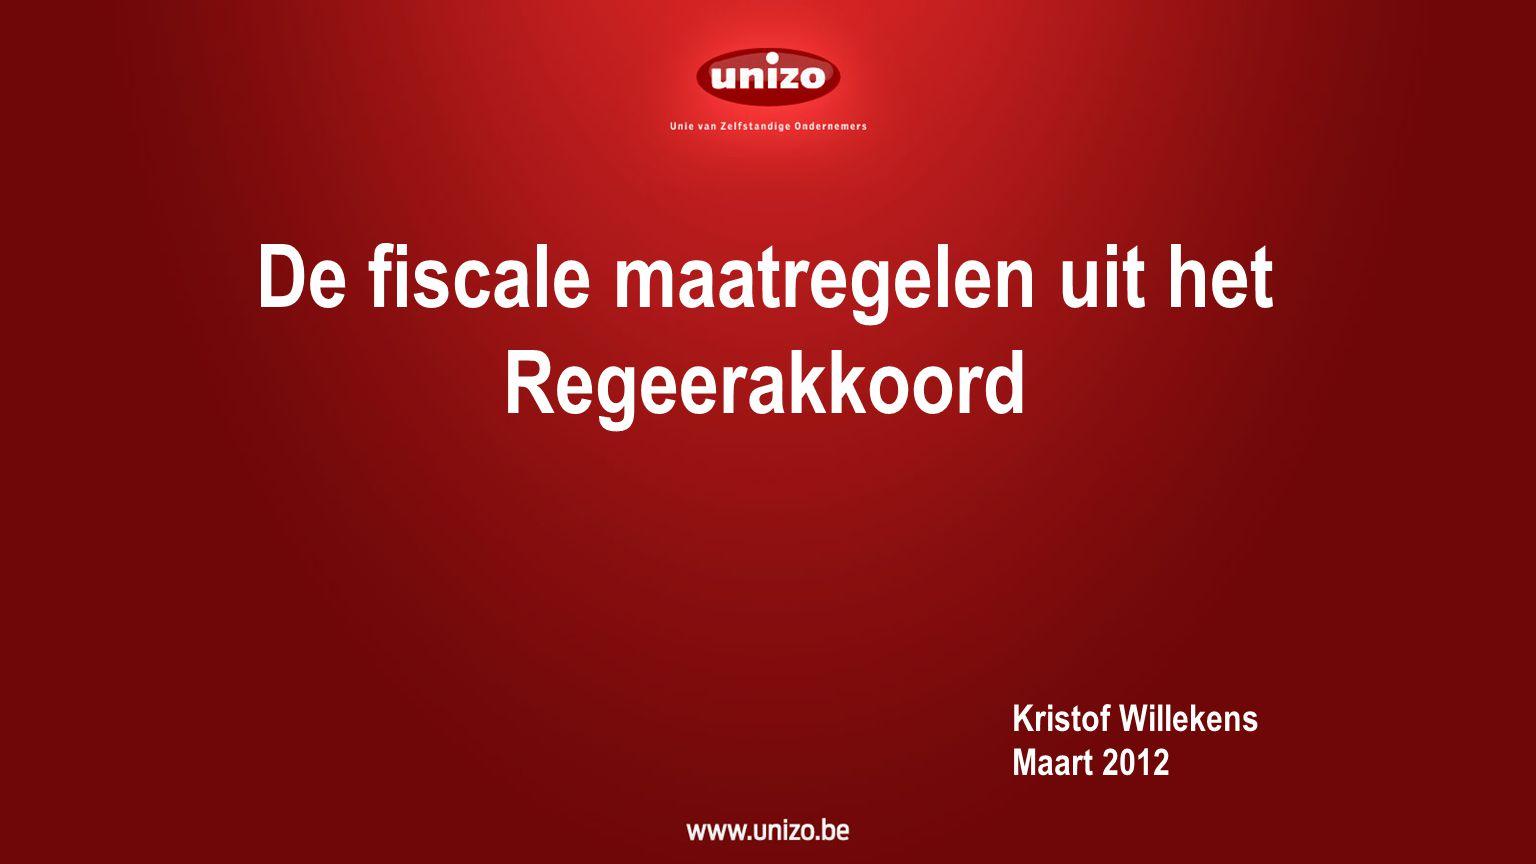 51 Uitgangspunten 11 miljard euro + 2 miljard bij begrotingscontrole Europese aanbevelingen Basis nota Di Rupo ↔ UNIZO : uitgaven .